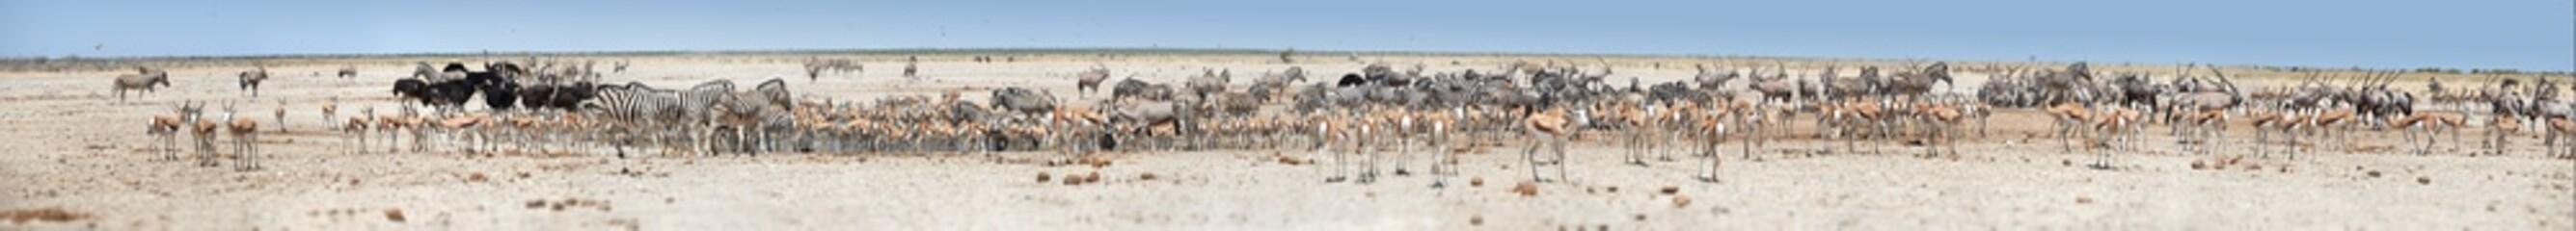 Very long panoramic photo of huge herds of wildlife drinking at busy waterhole, Etosha, Namibia. Etosha national park safari game drive. Wildlife photography in South Africa, Botswana and Namibia.